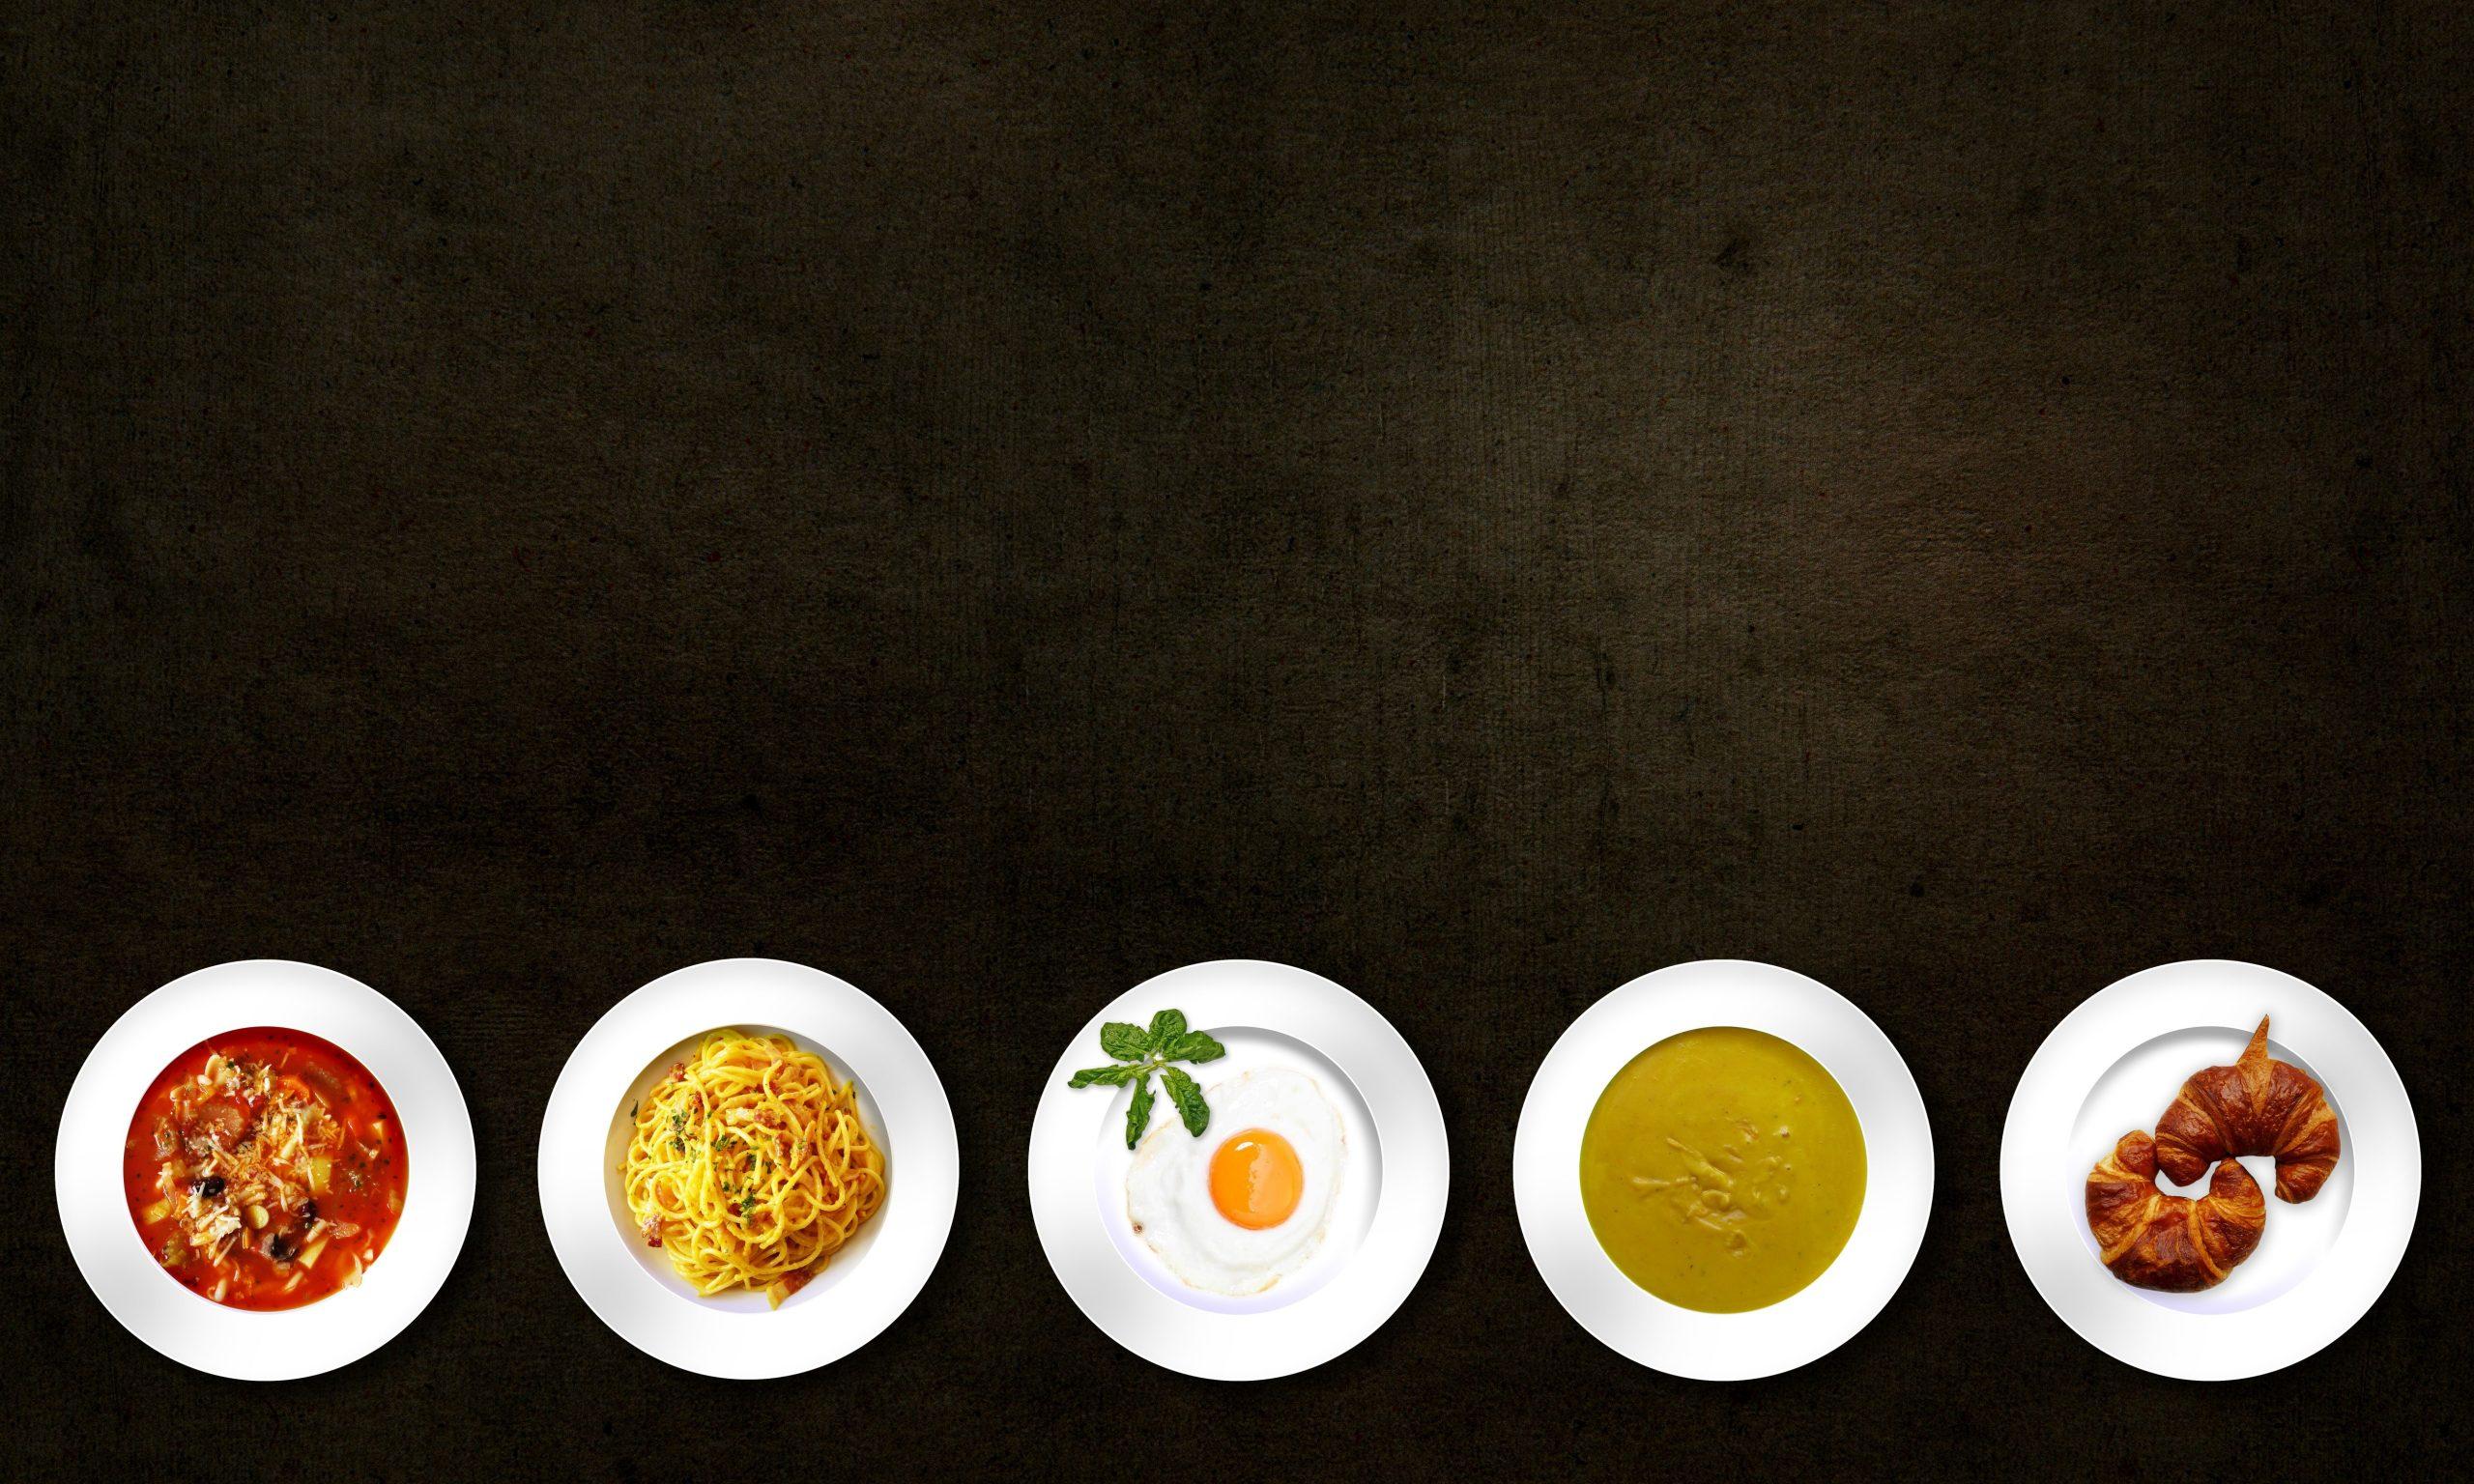 Food crowns modern trends